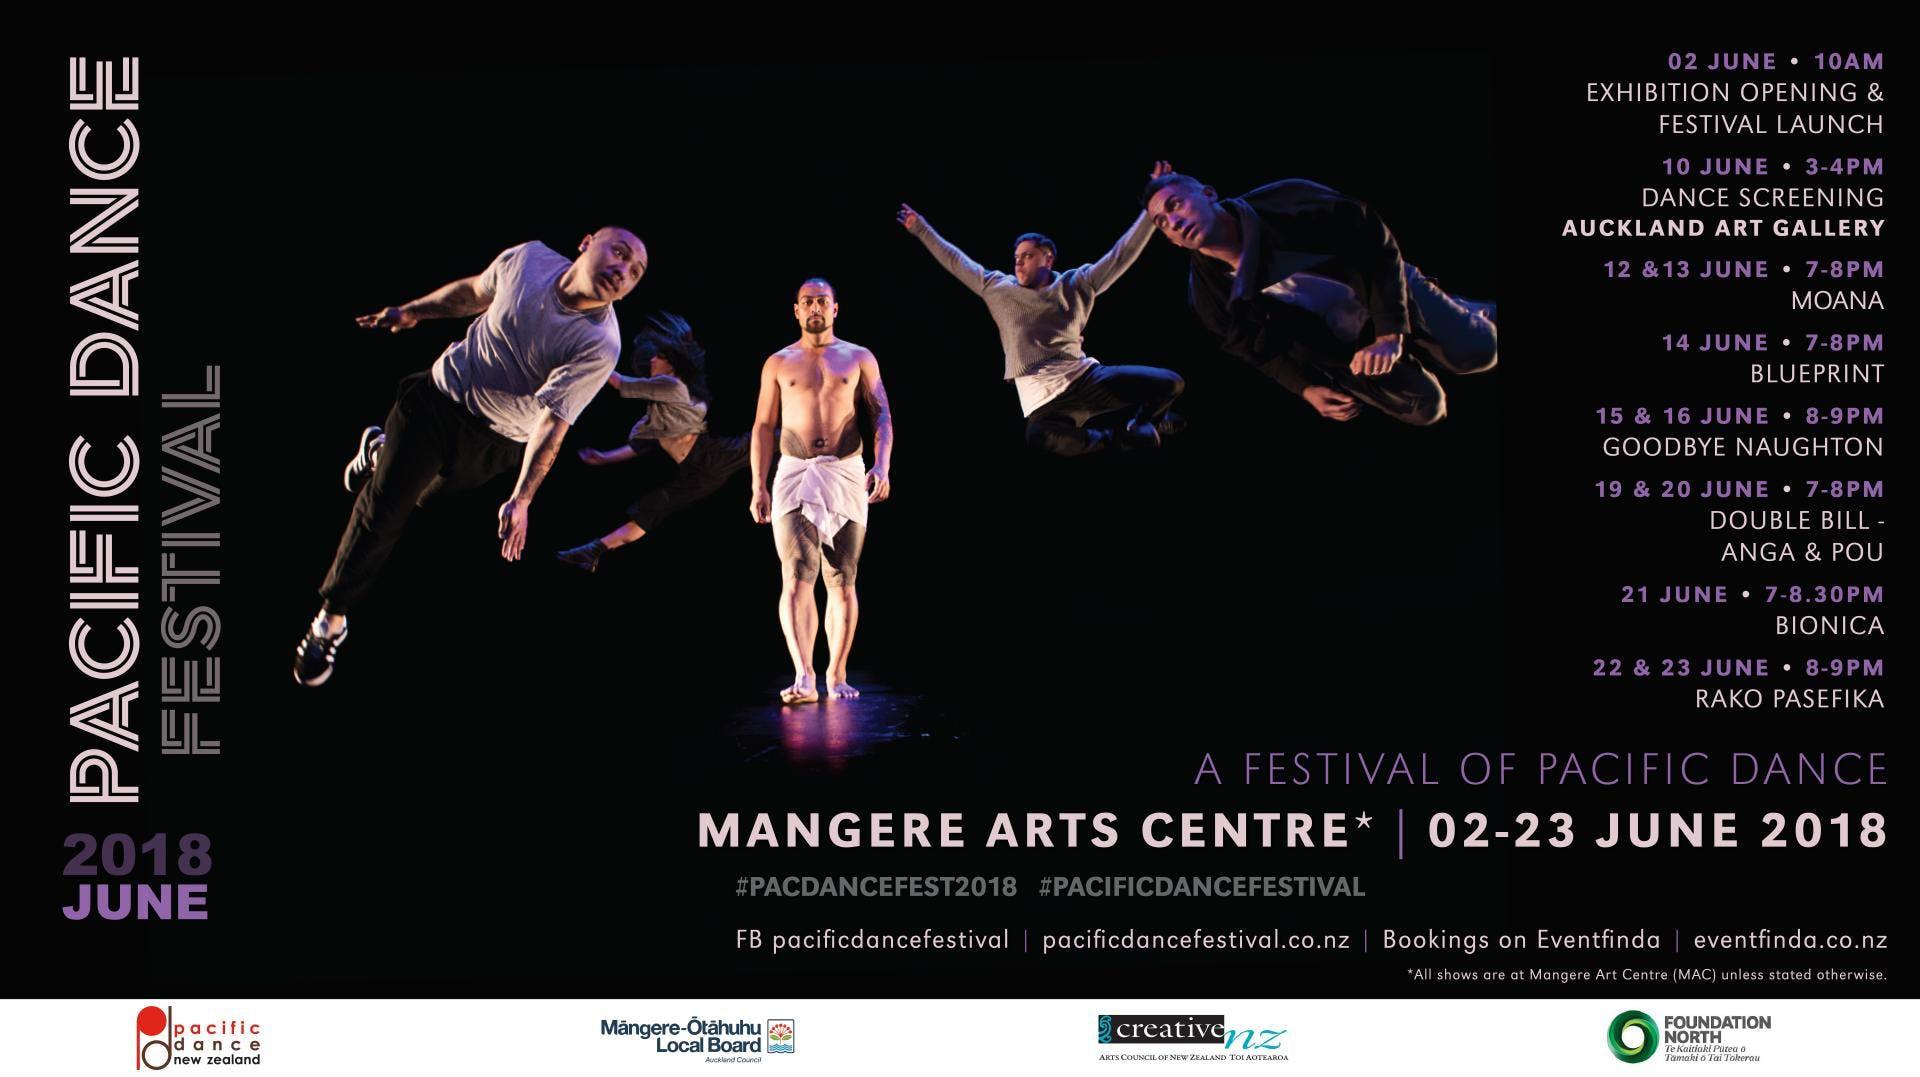 Blickfang Sachsendamm 20 Galerie Von Pacific Dance Festival Launch